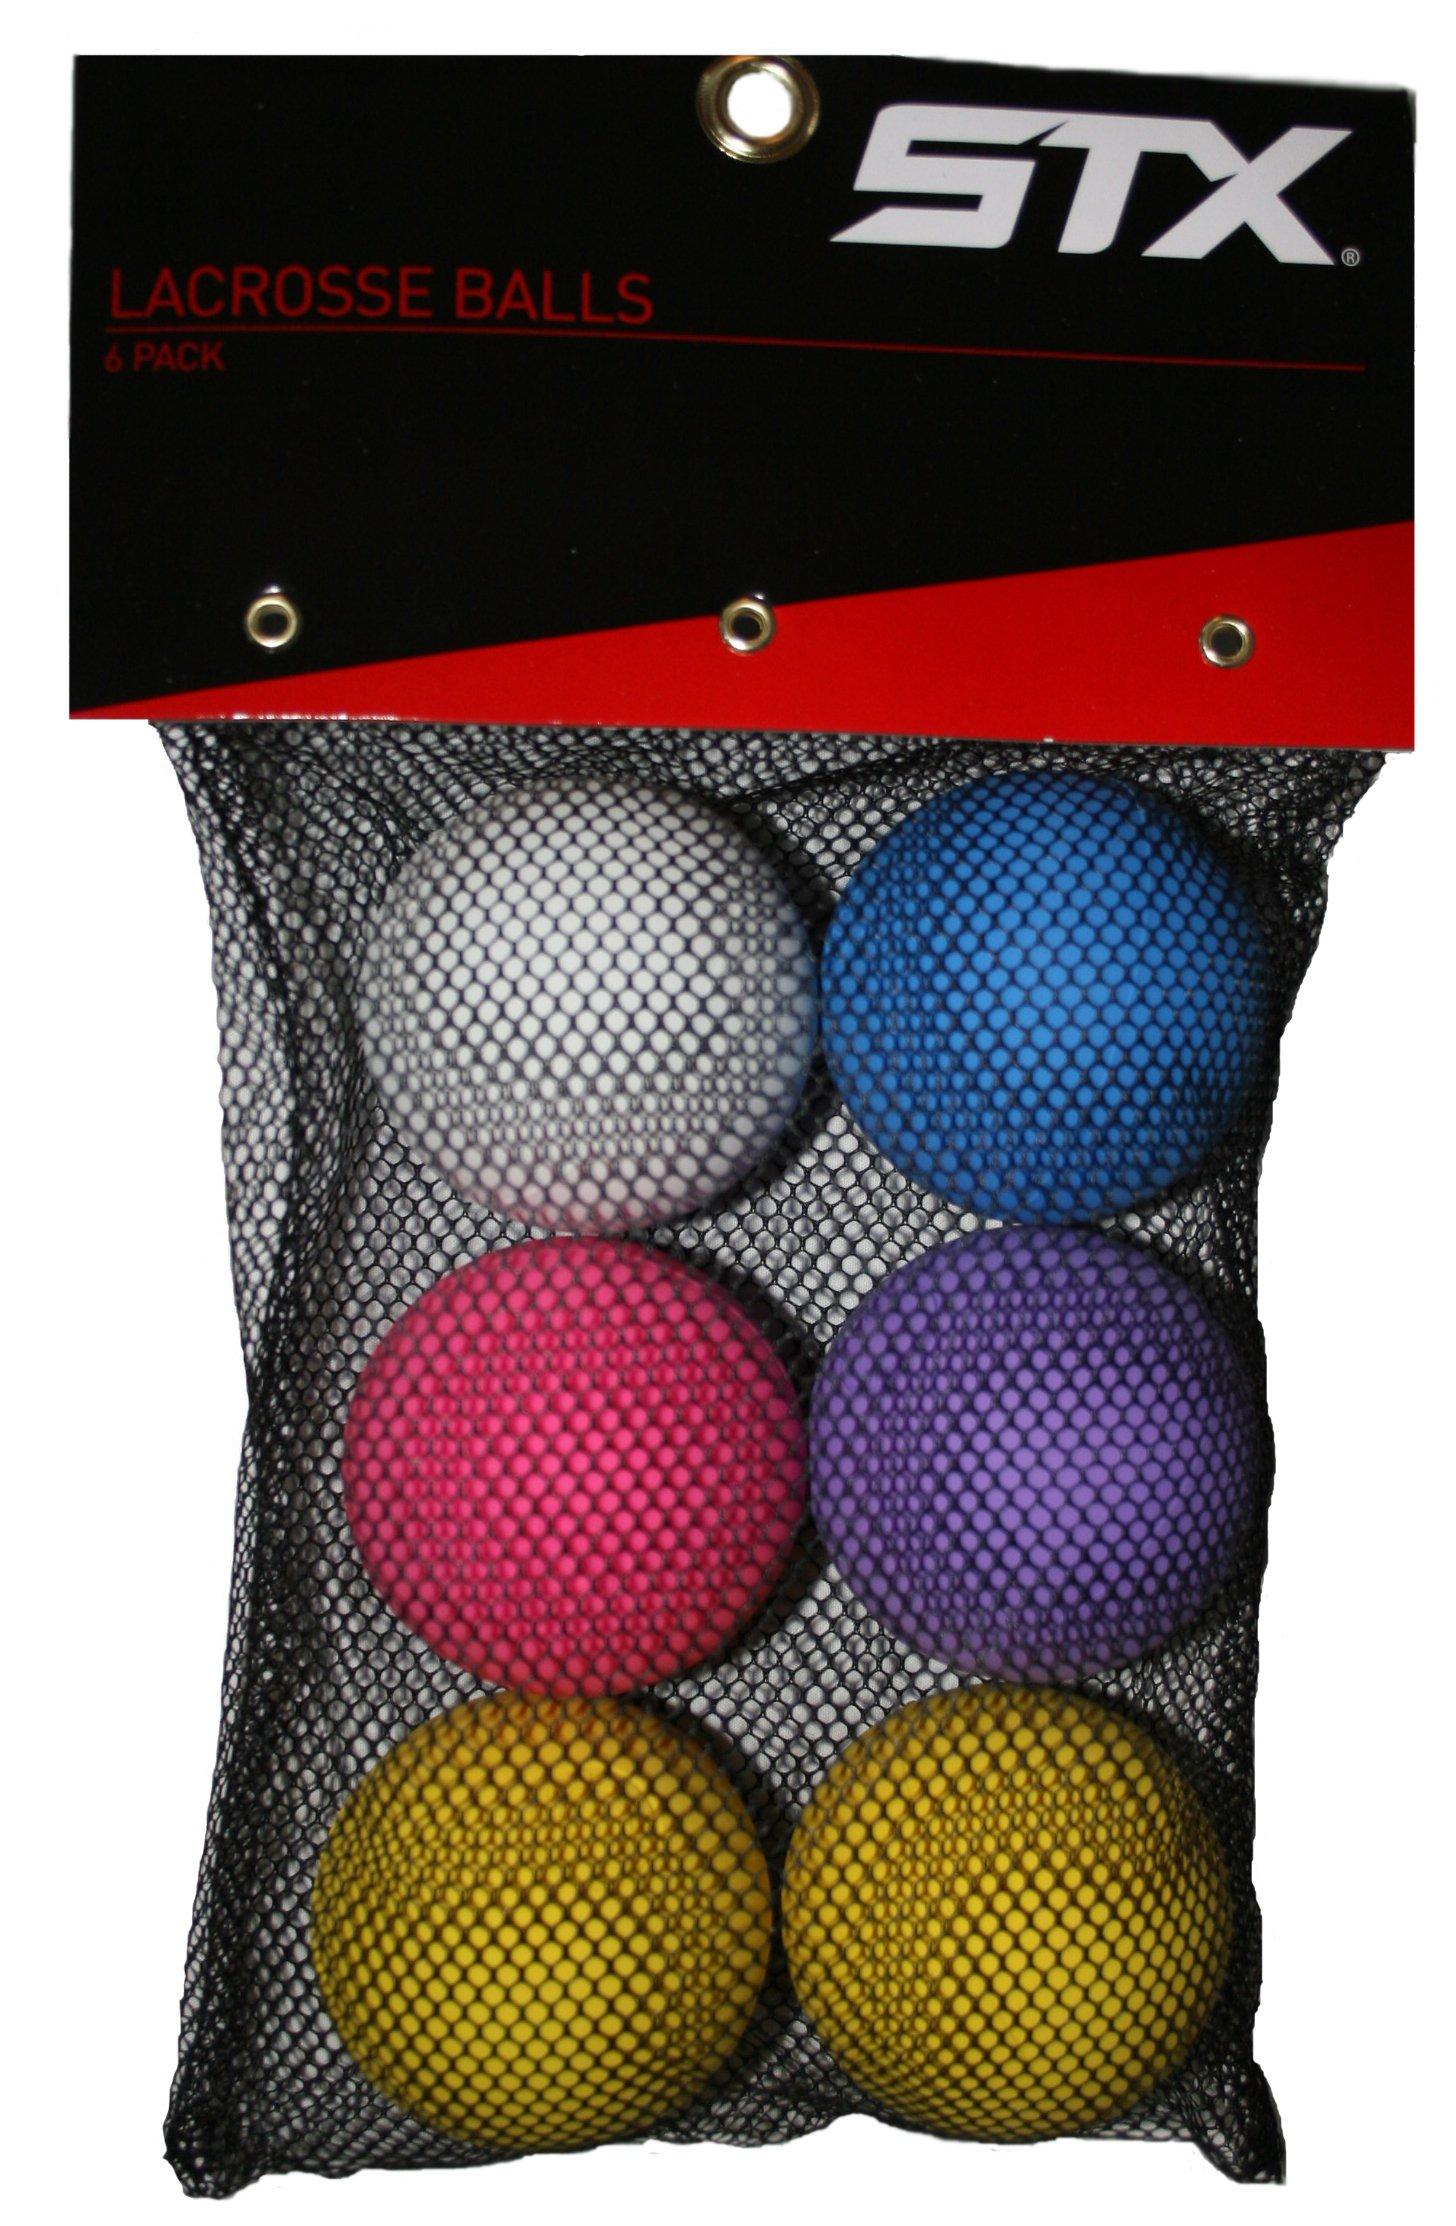 STX Lacrosse Balls in Mesh Bag (Pack of 6), Assorted Colors